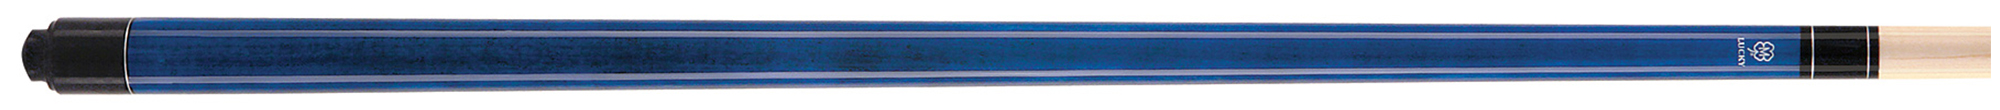 PK3071-2: Lucky L2 Blue by McDermott #1